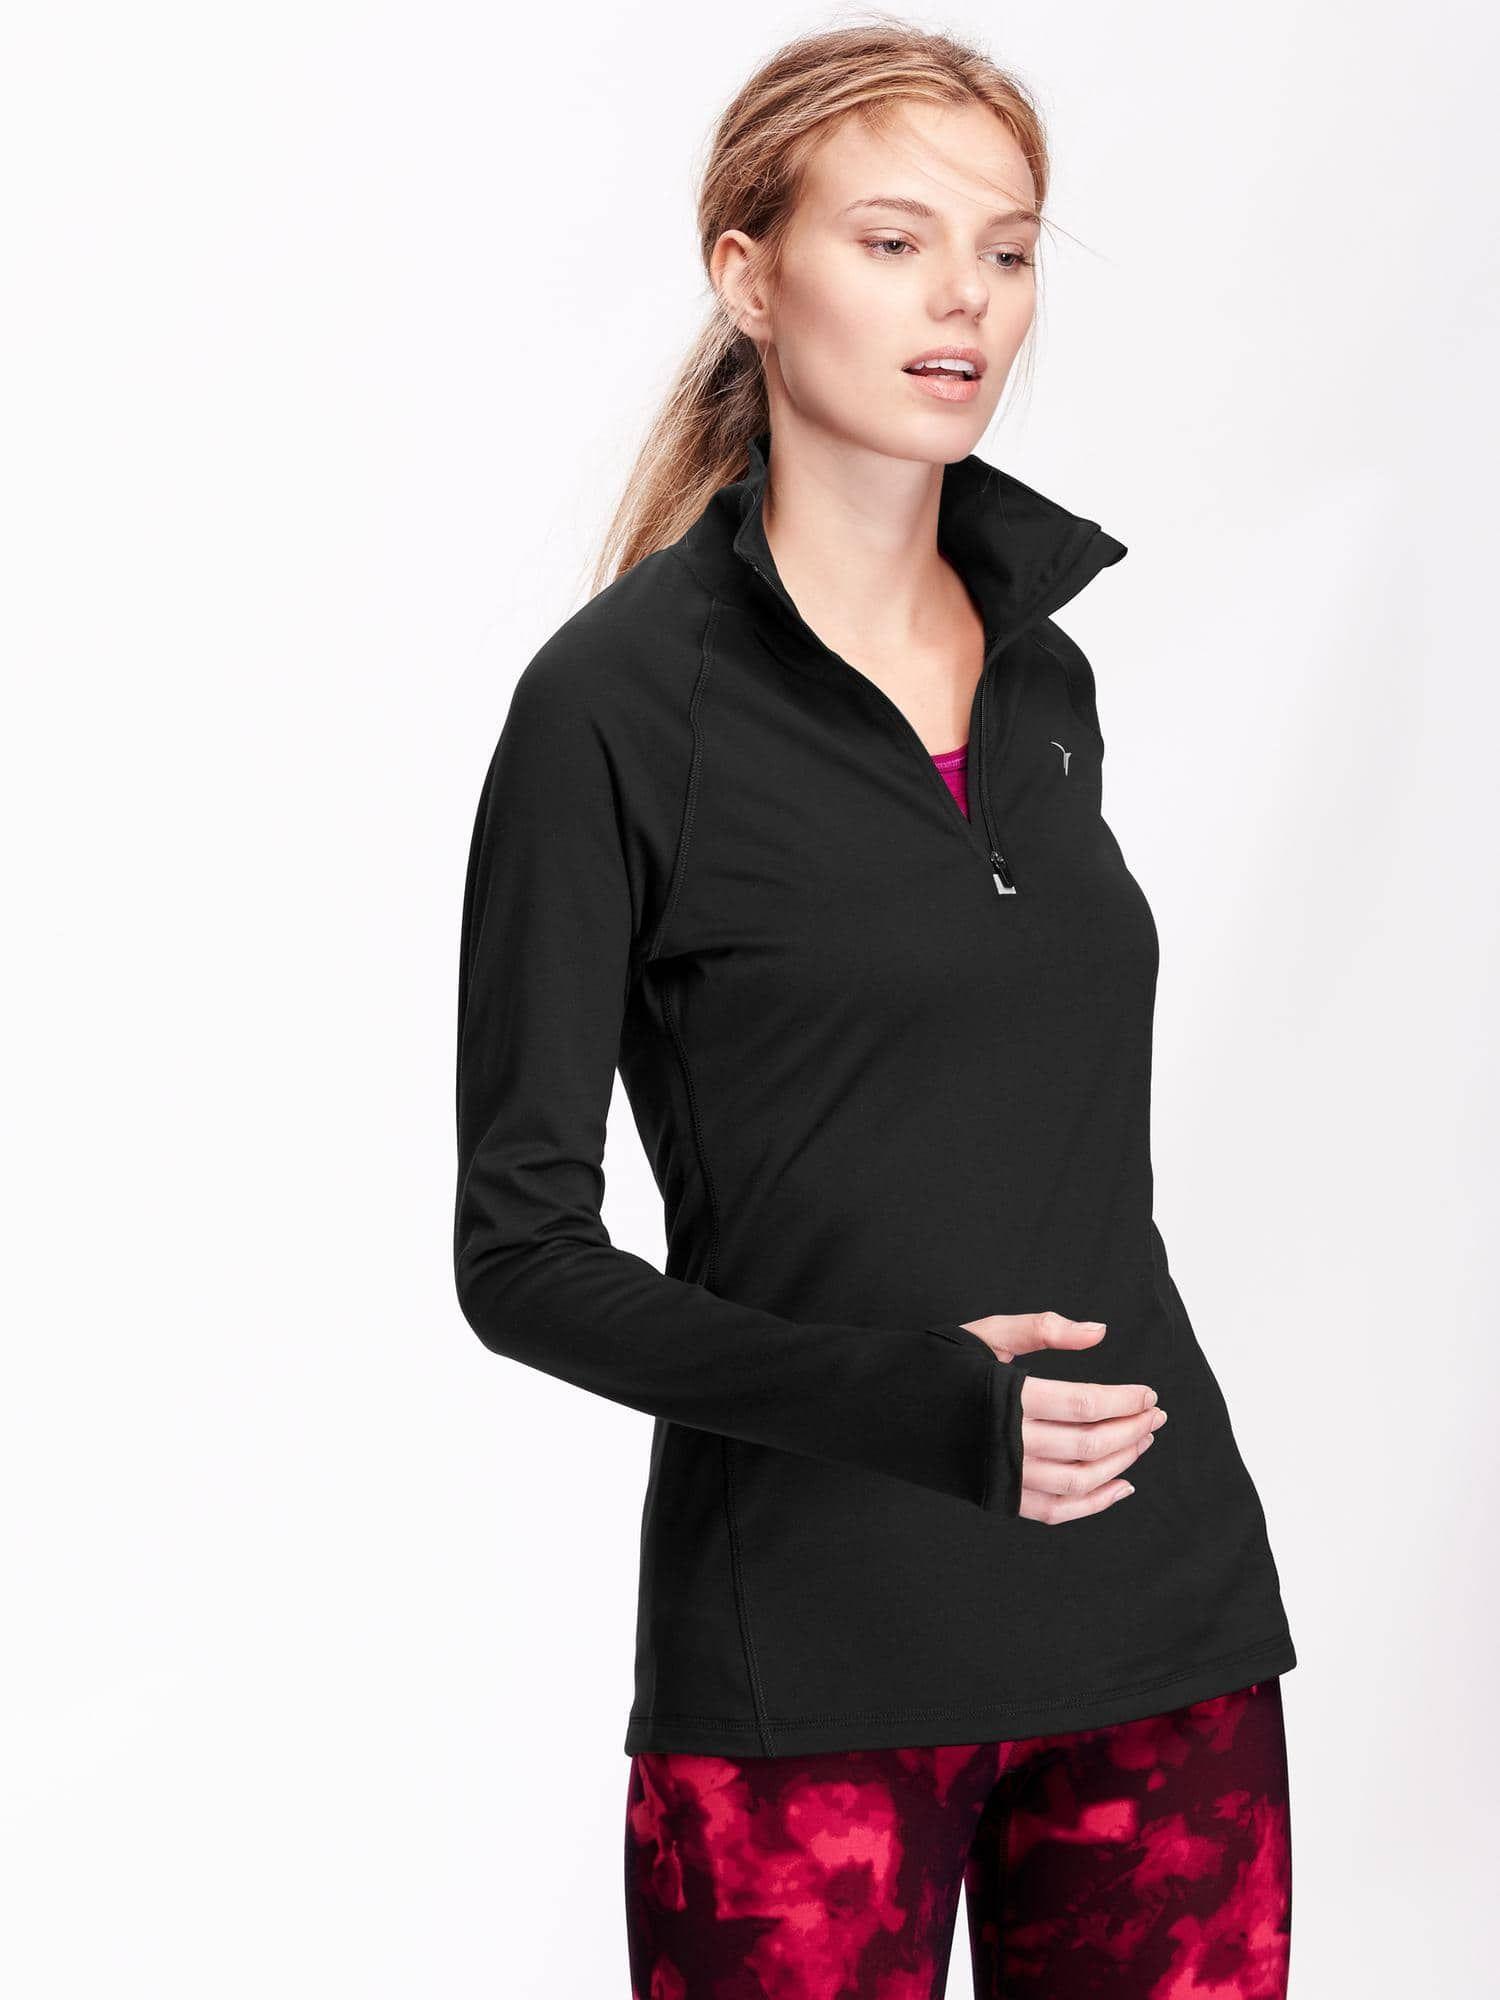 990fb64332c716 Go-Dry Performance 1 4 Zip Pullover for Women